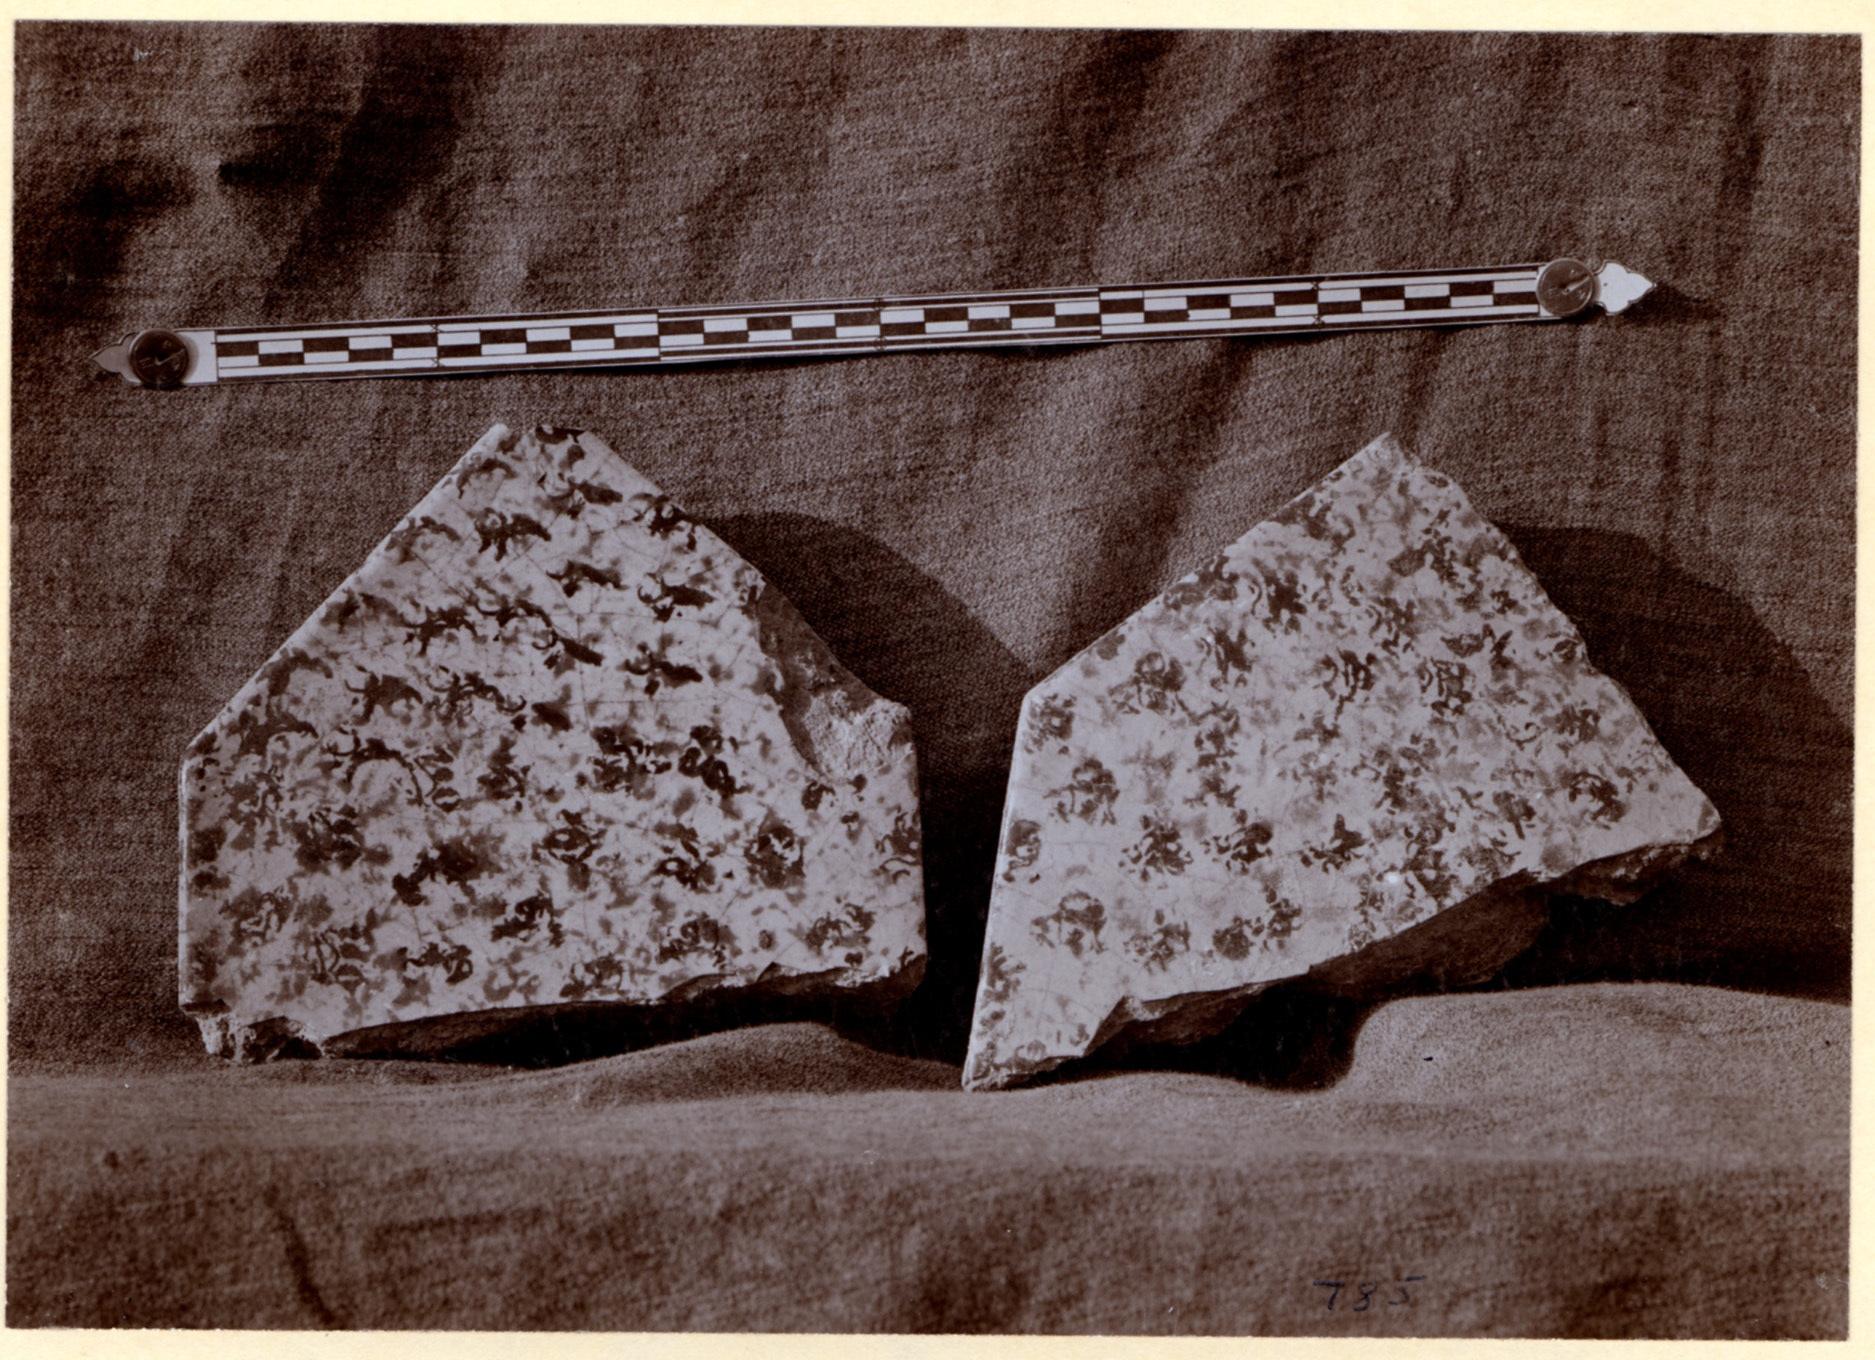 Excavation of Samarra (Iraq): Fragments of Ceramic Tiles, Found in Palace of the Caliph (Dar al-Khilafa, Jawsaq al-Khaqani, Bayt al-Khalifah)